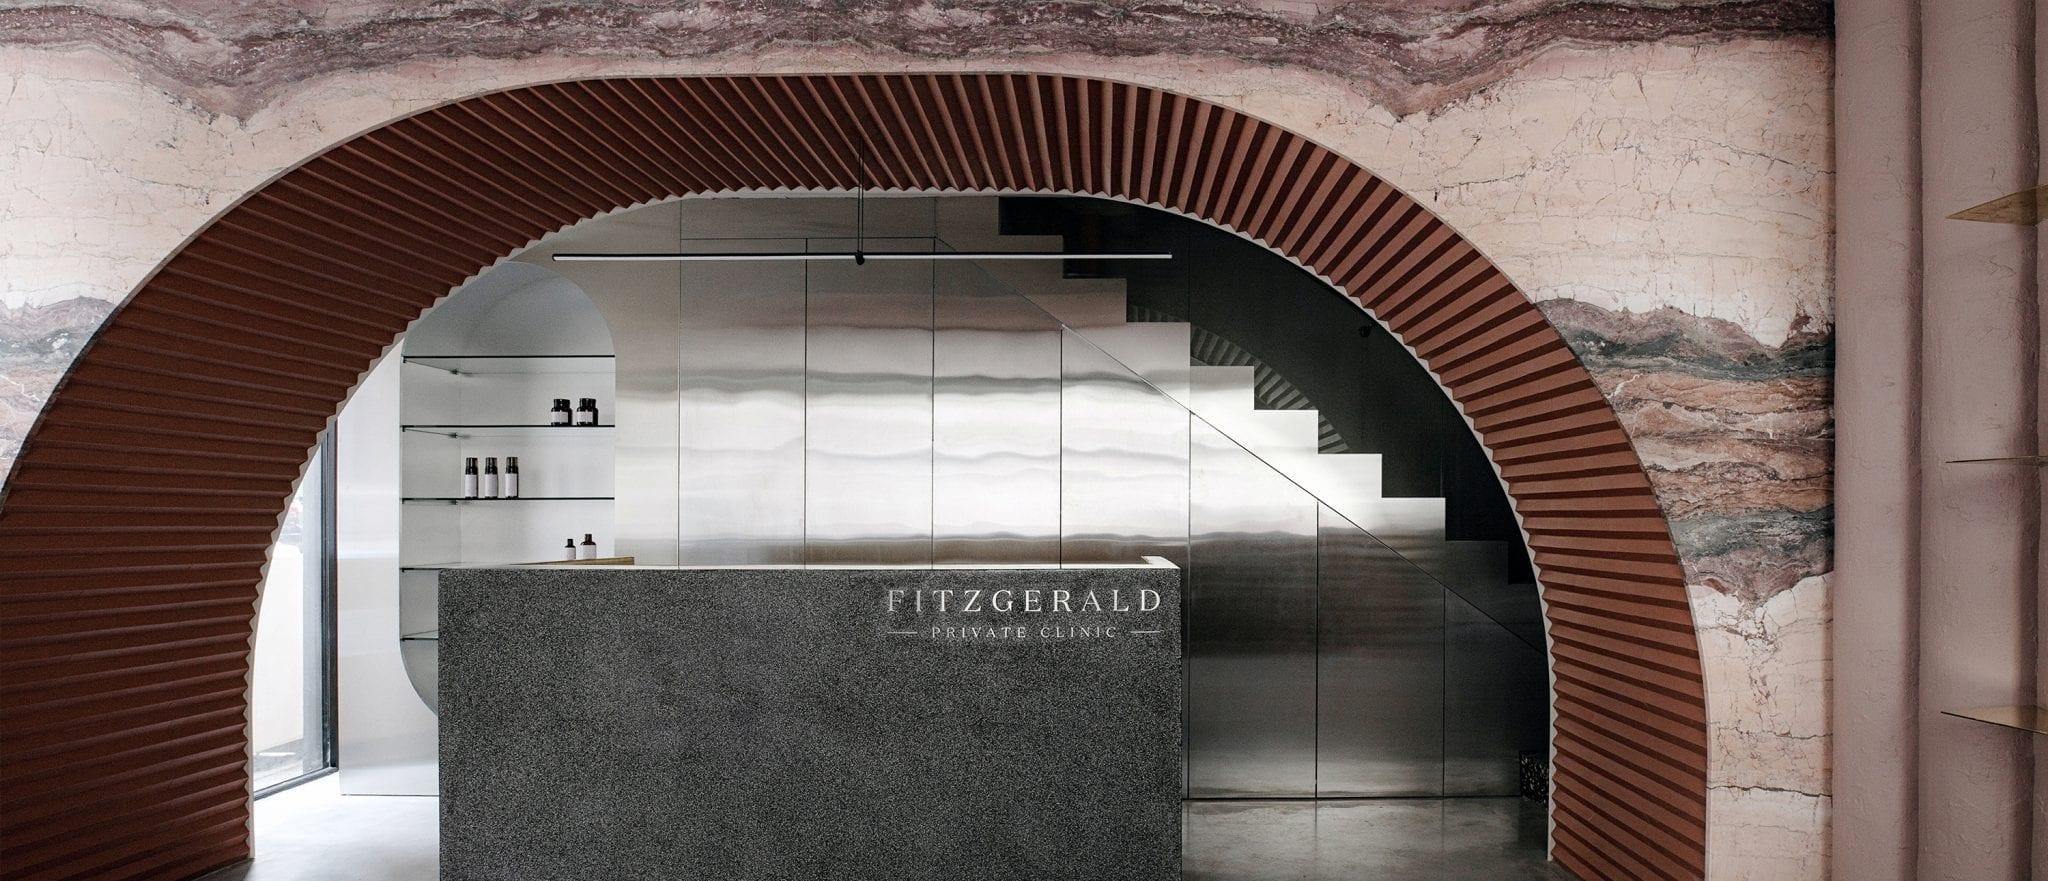 FITZGERALD CLINIC